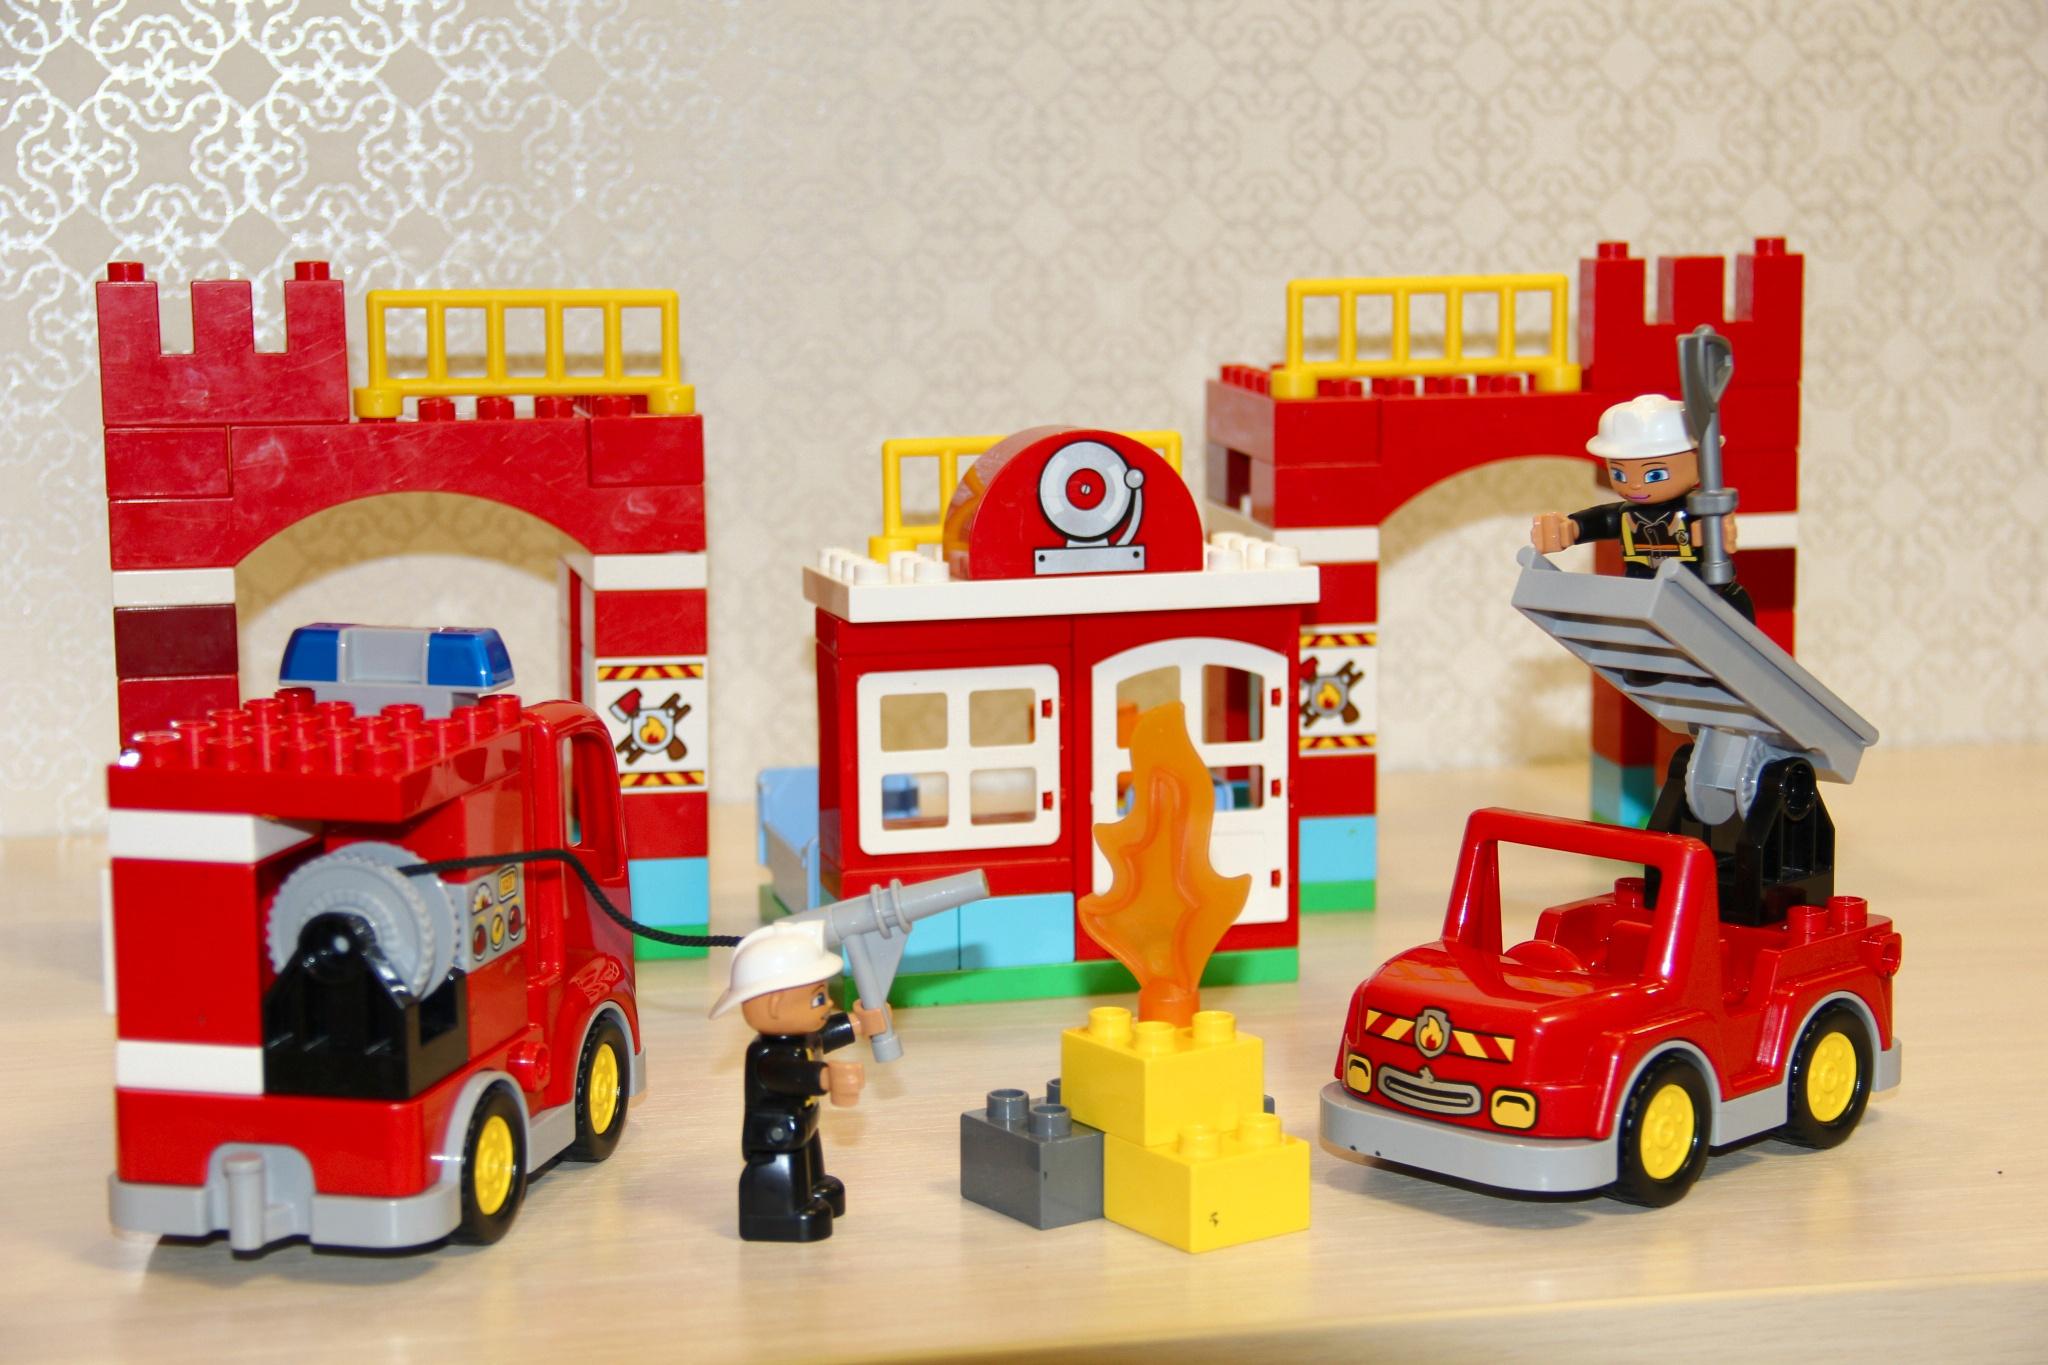 Lego Duplo 10593 Fire Station 12